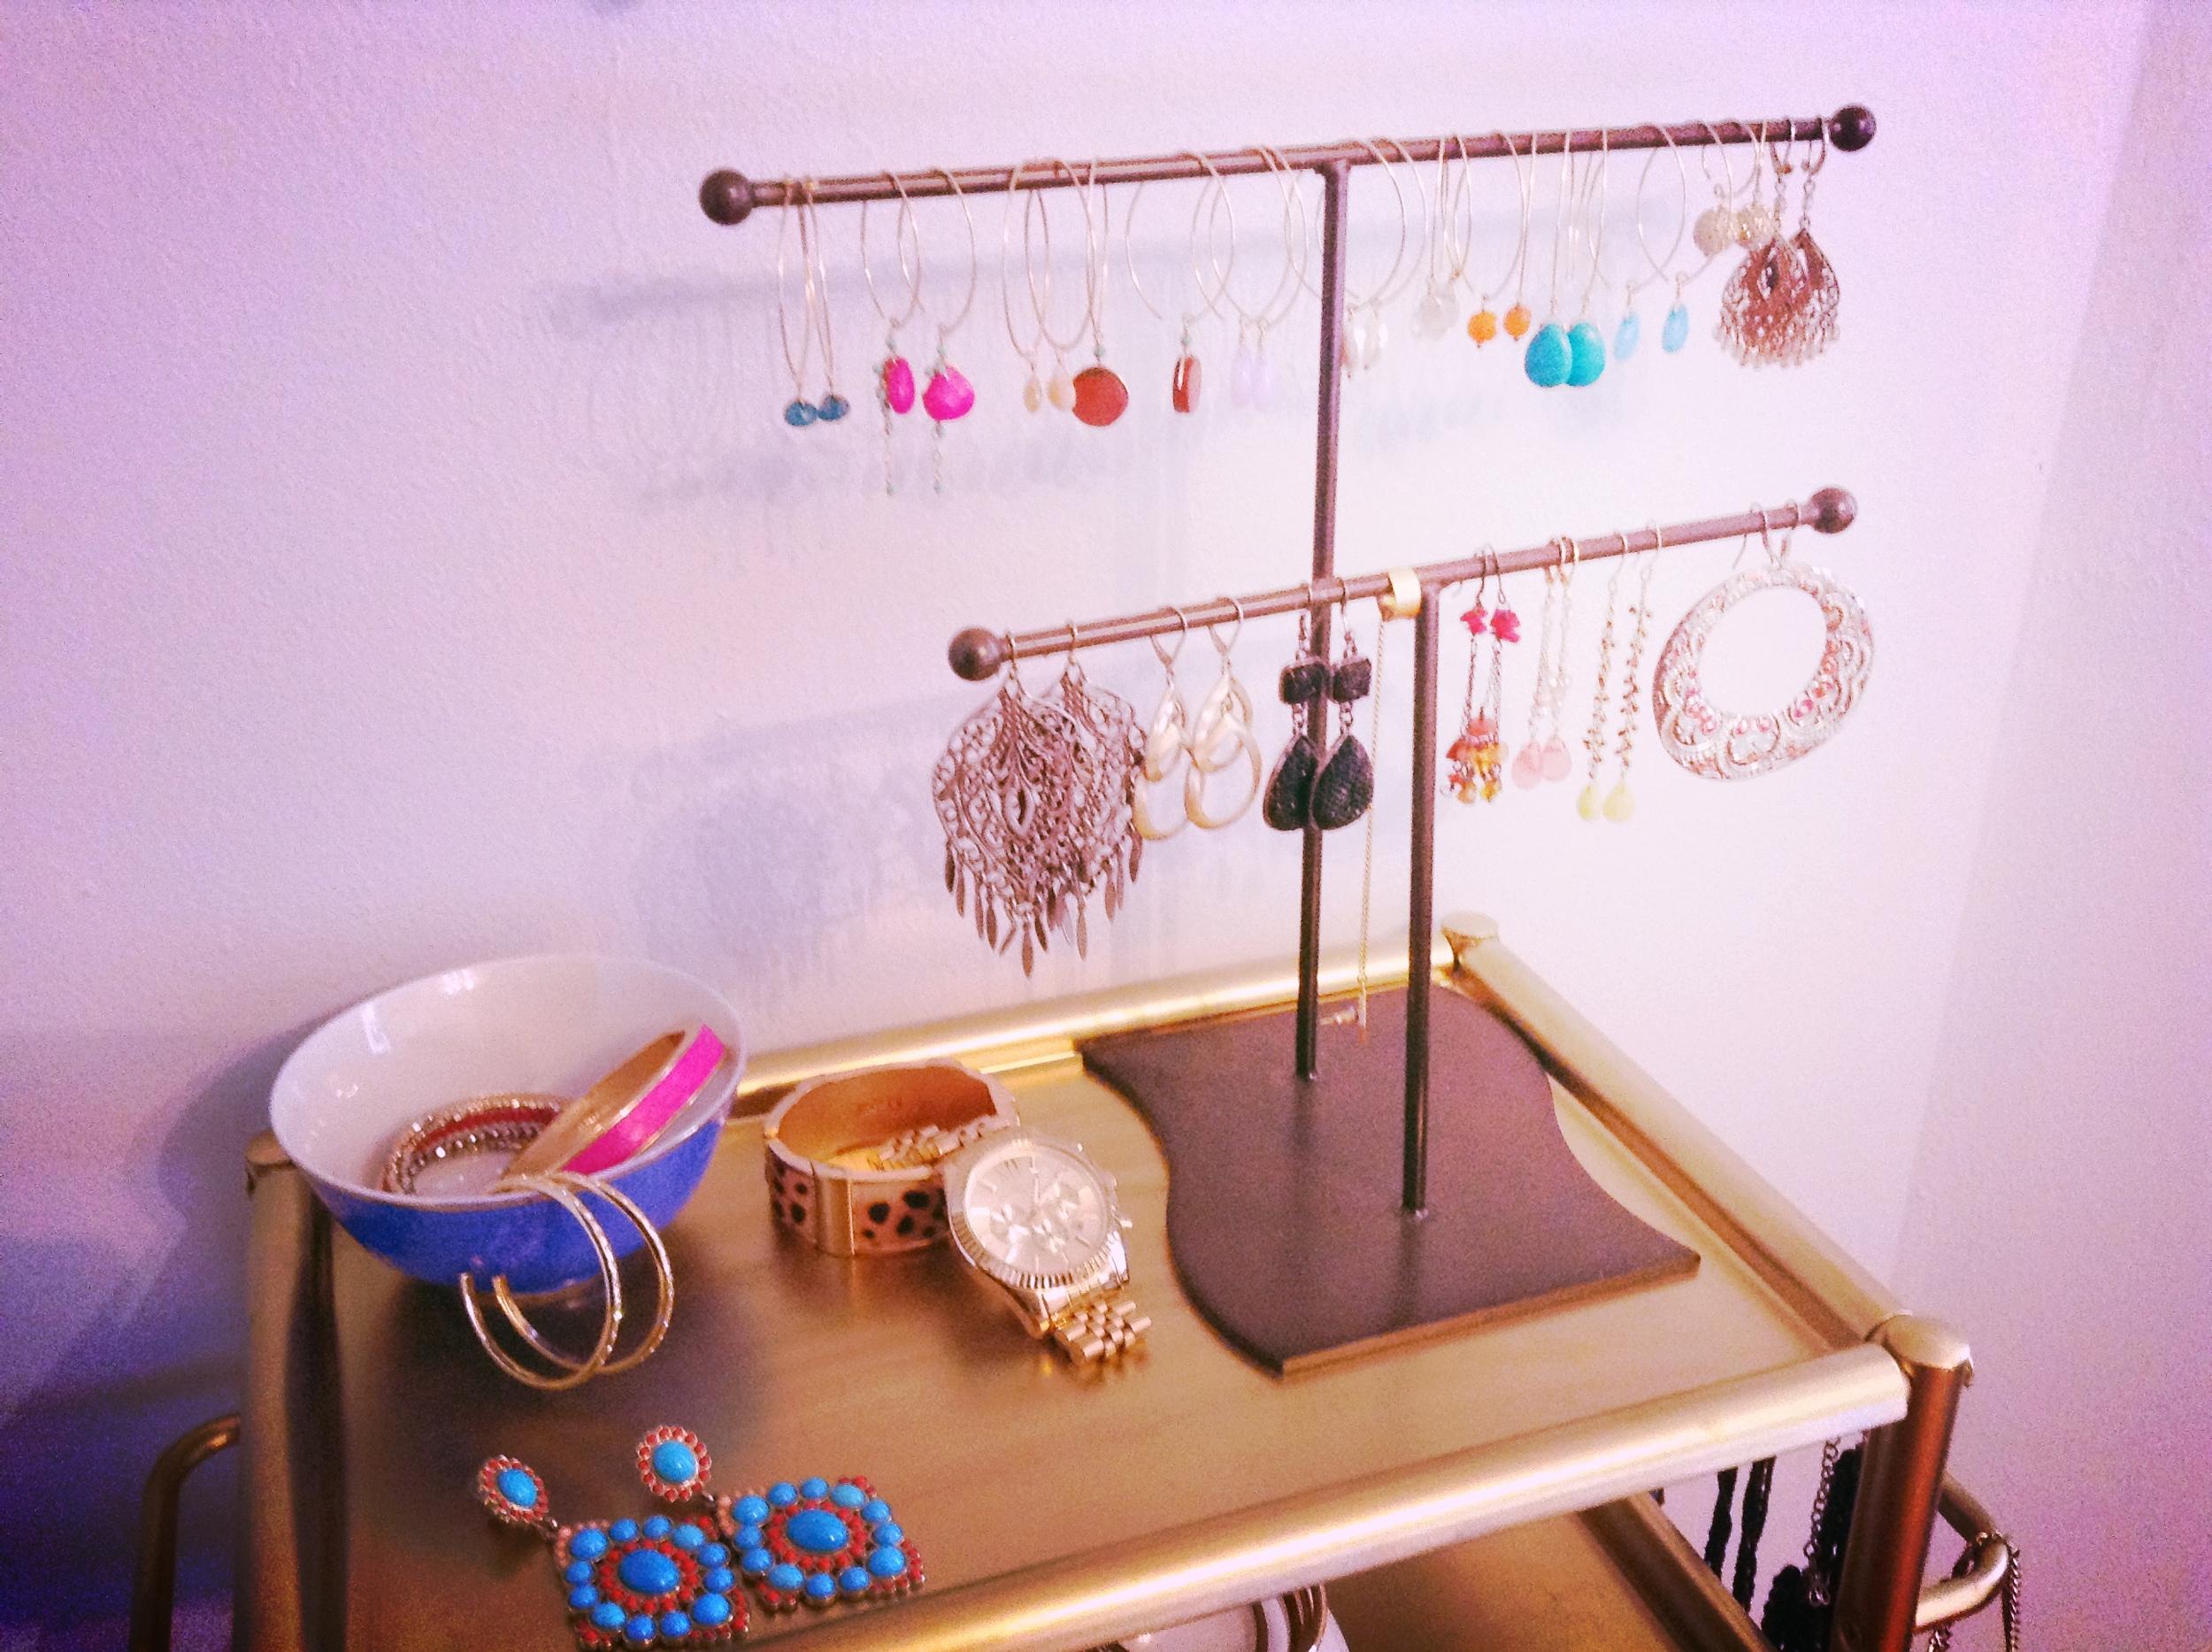 detailthreejewelry.JPG